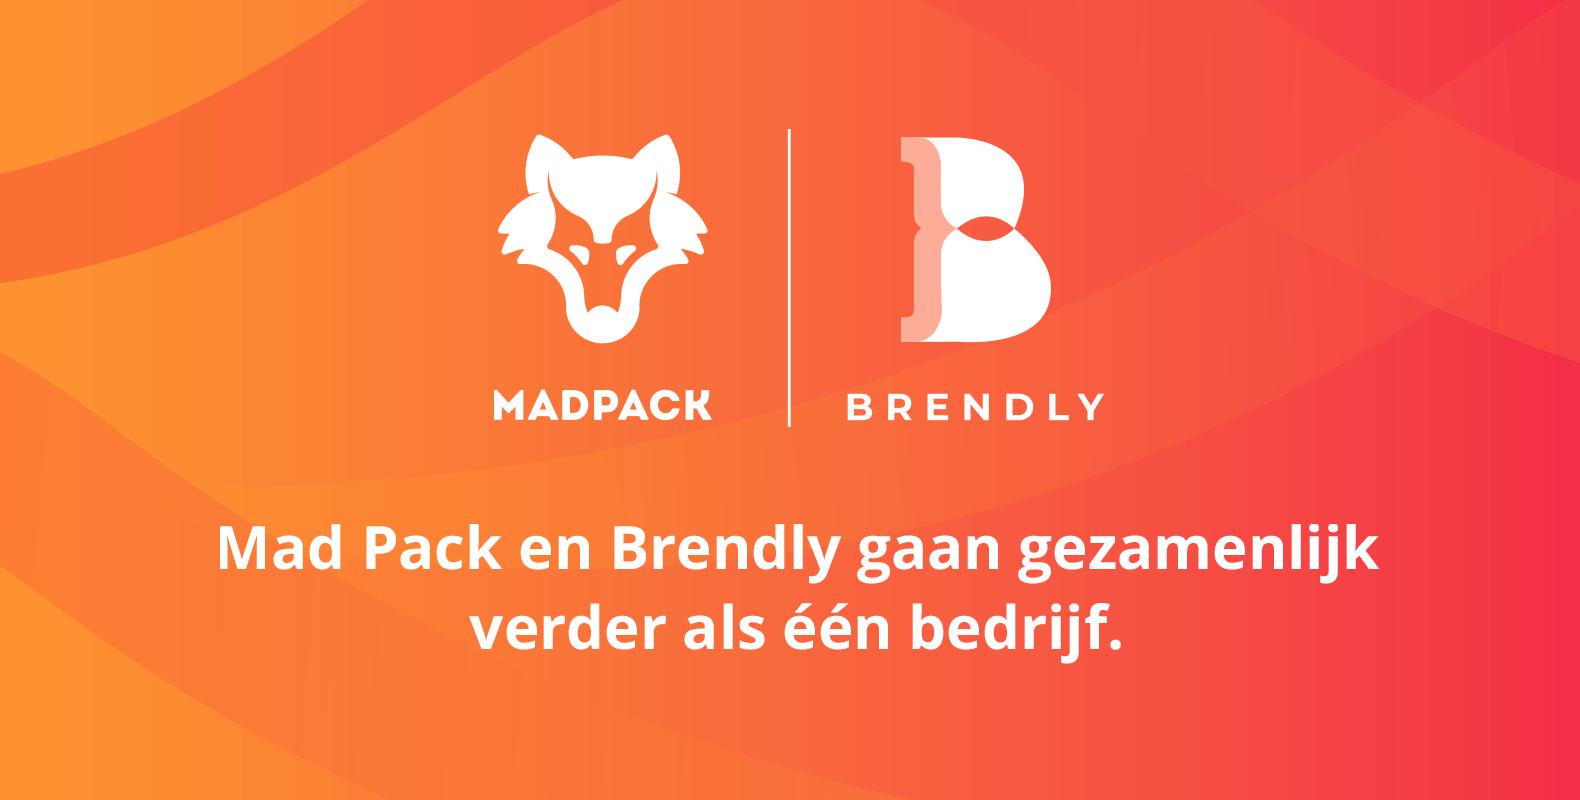 Mad Pack en Brendly gaan gezamenlijk verder als één bedrijf